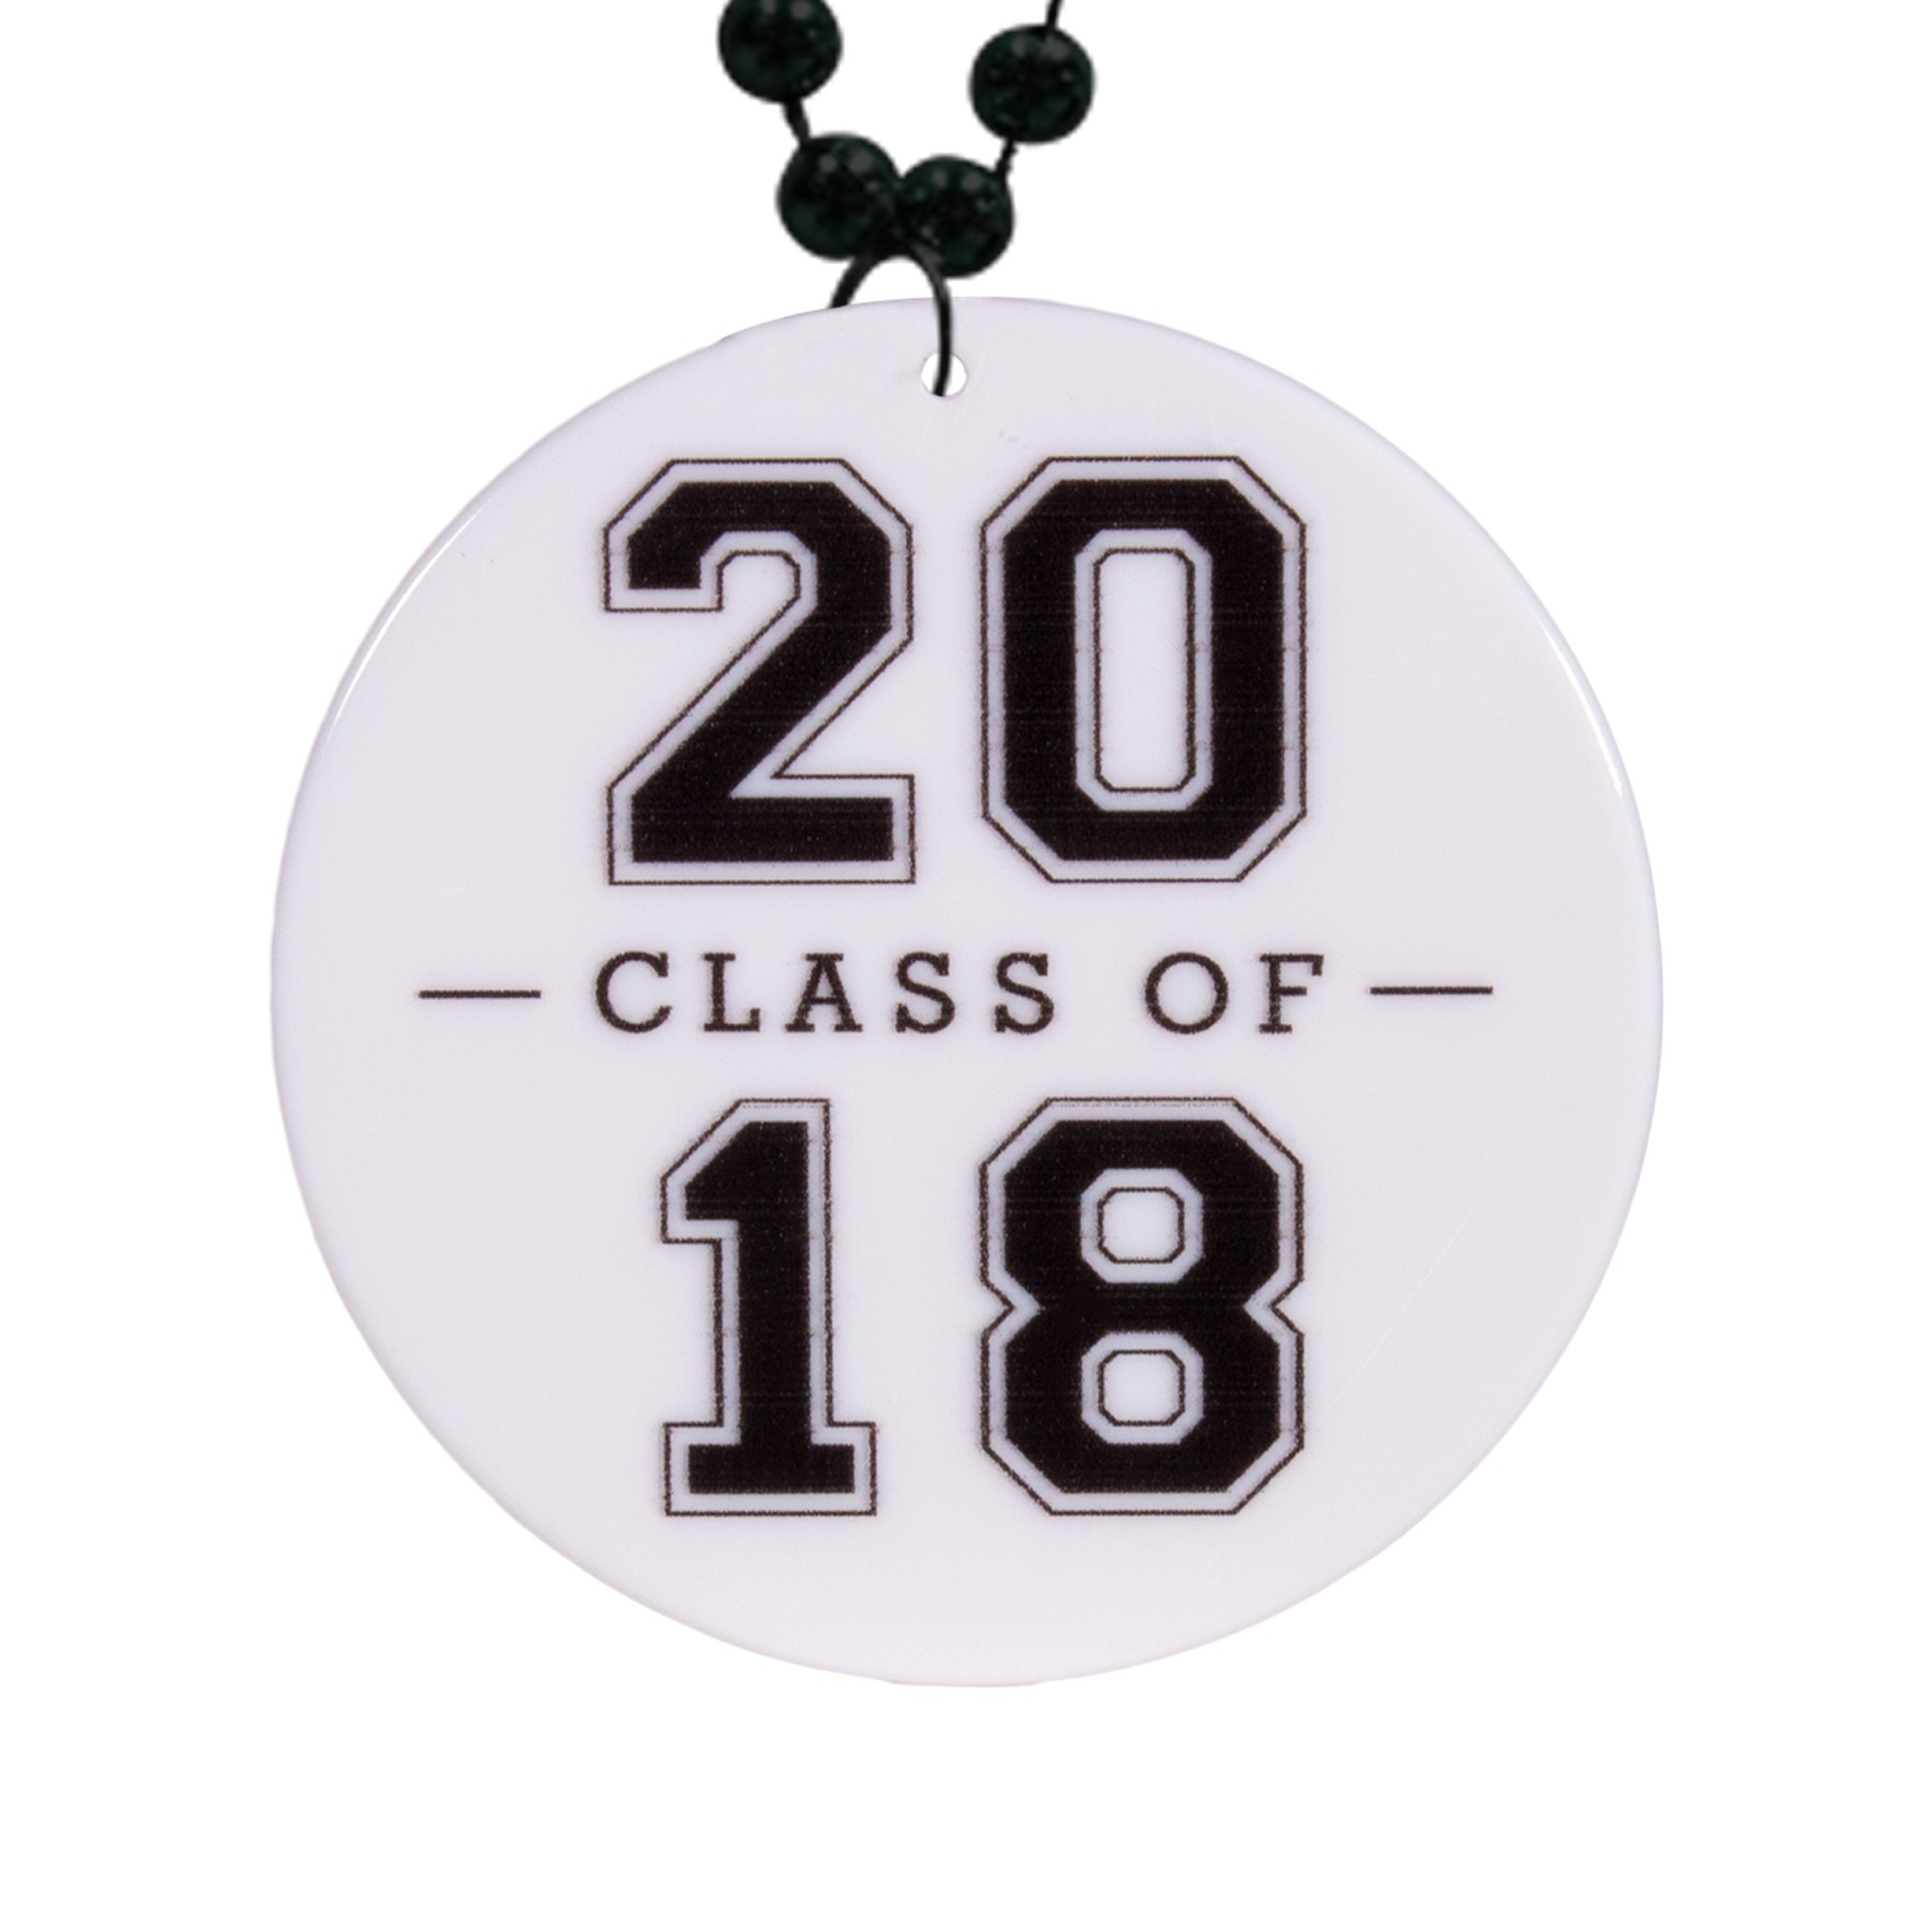 "Class of 2018 Graduation Plastic Medallions<br>2 1/2""</br>"